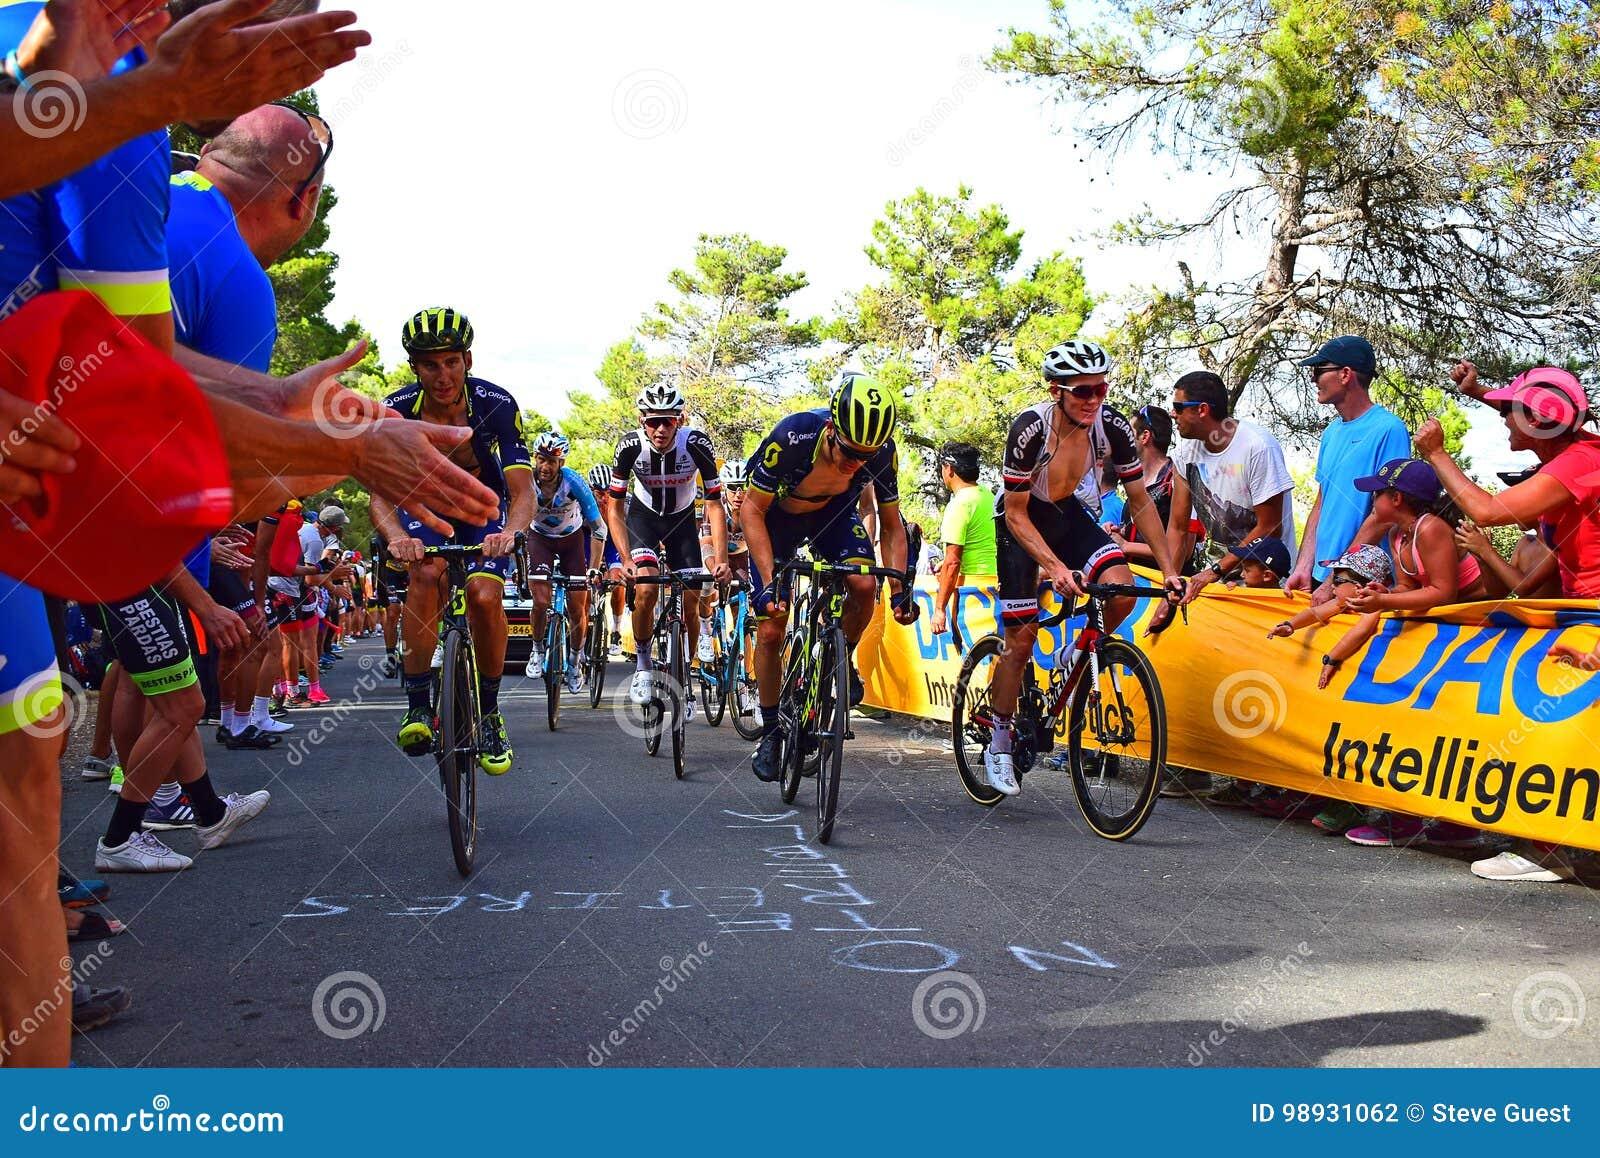 Professional Cycle Racers La Vuelta España Cycle Race